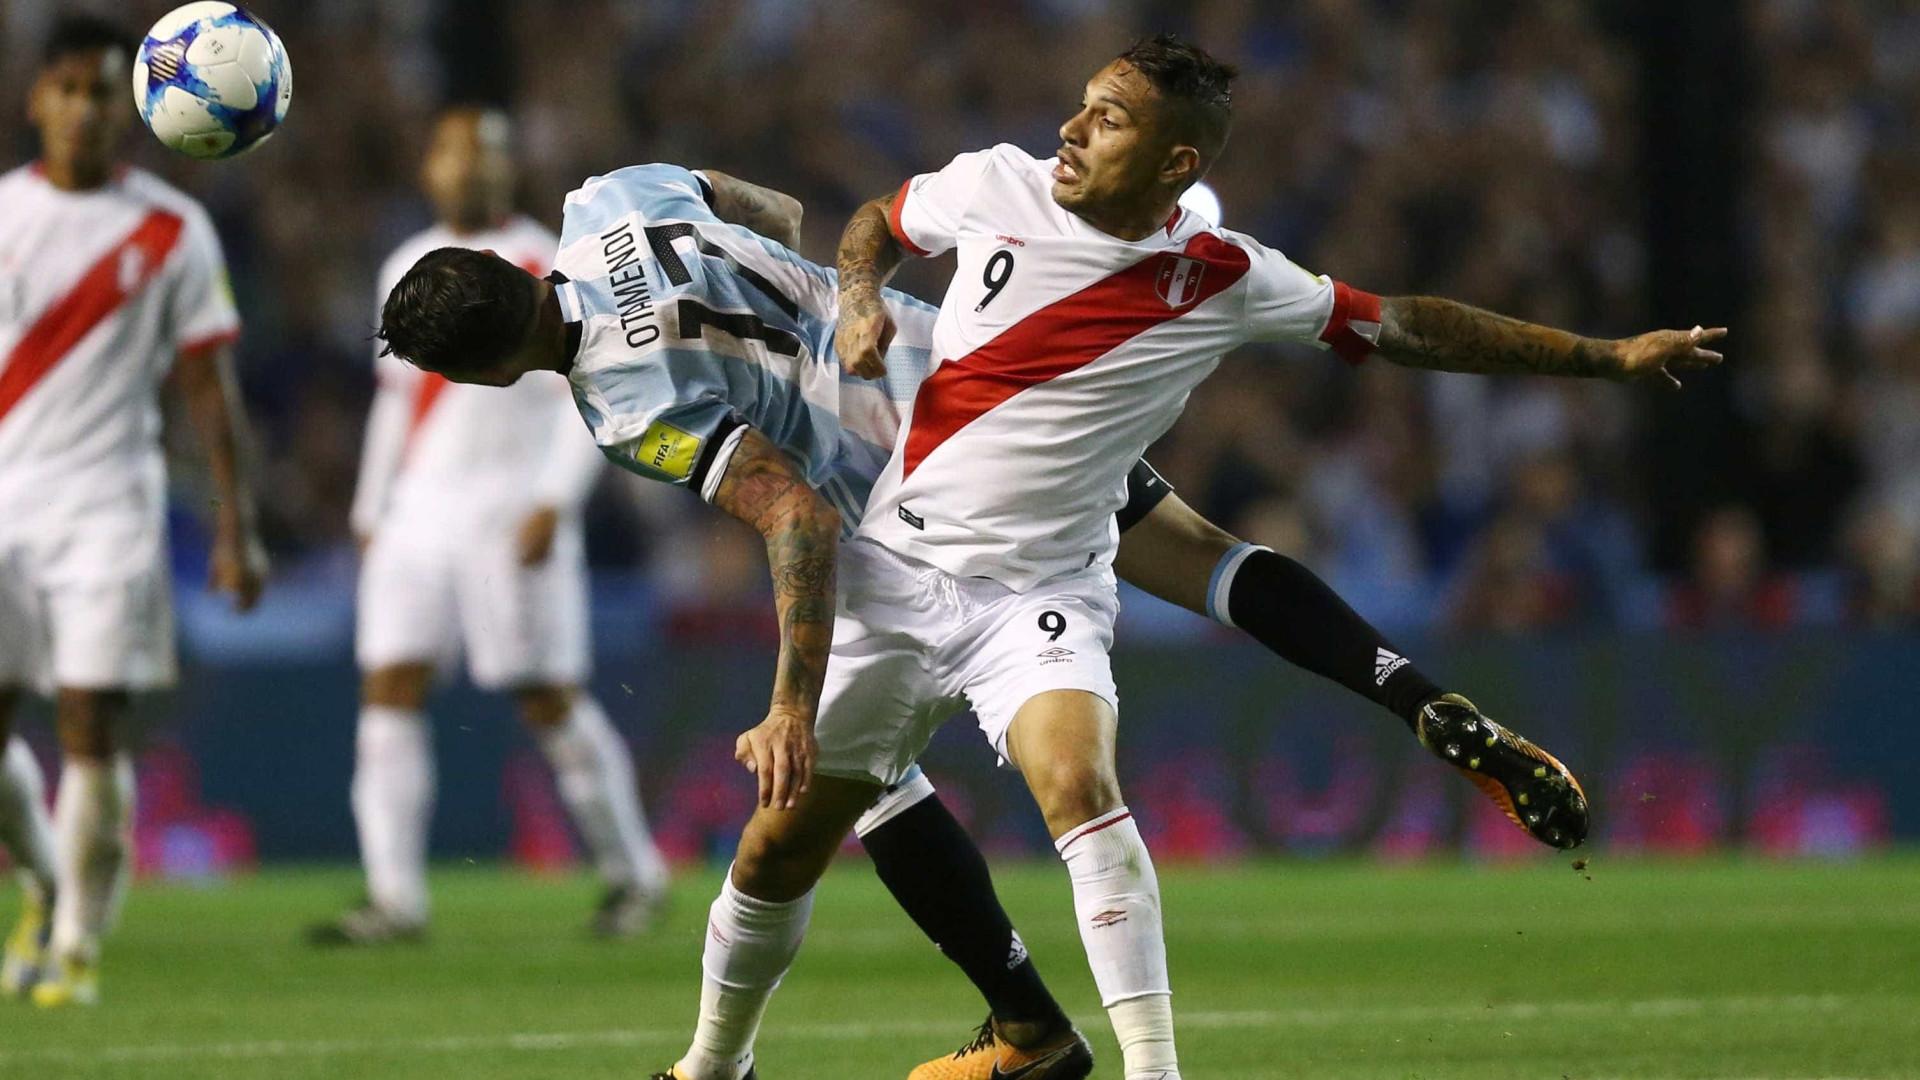 Jornalista argentino faz post ofensivo contra Guerrero e é criticado